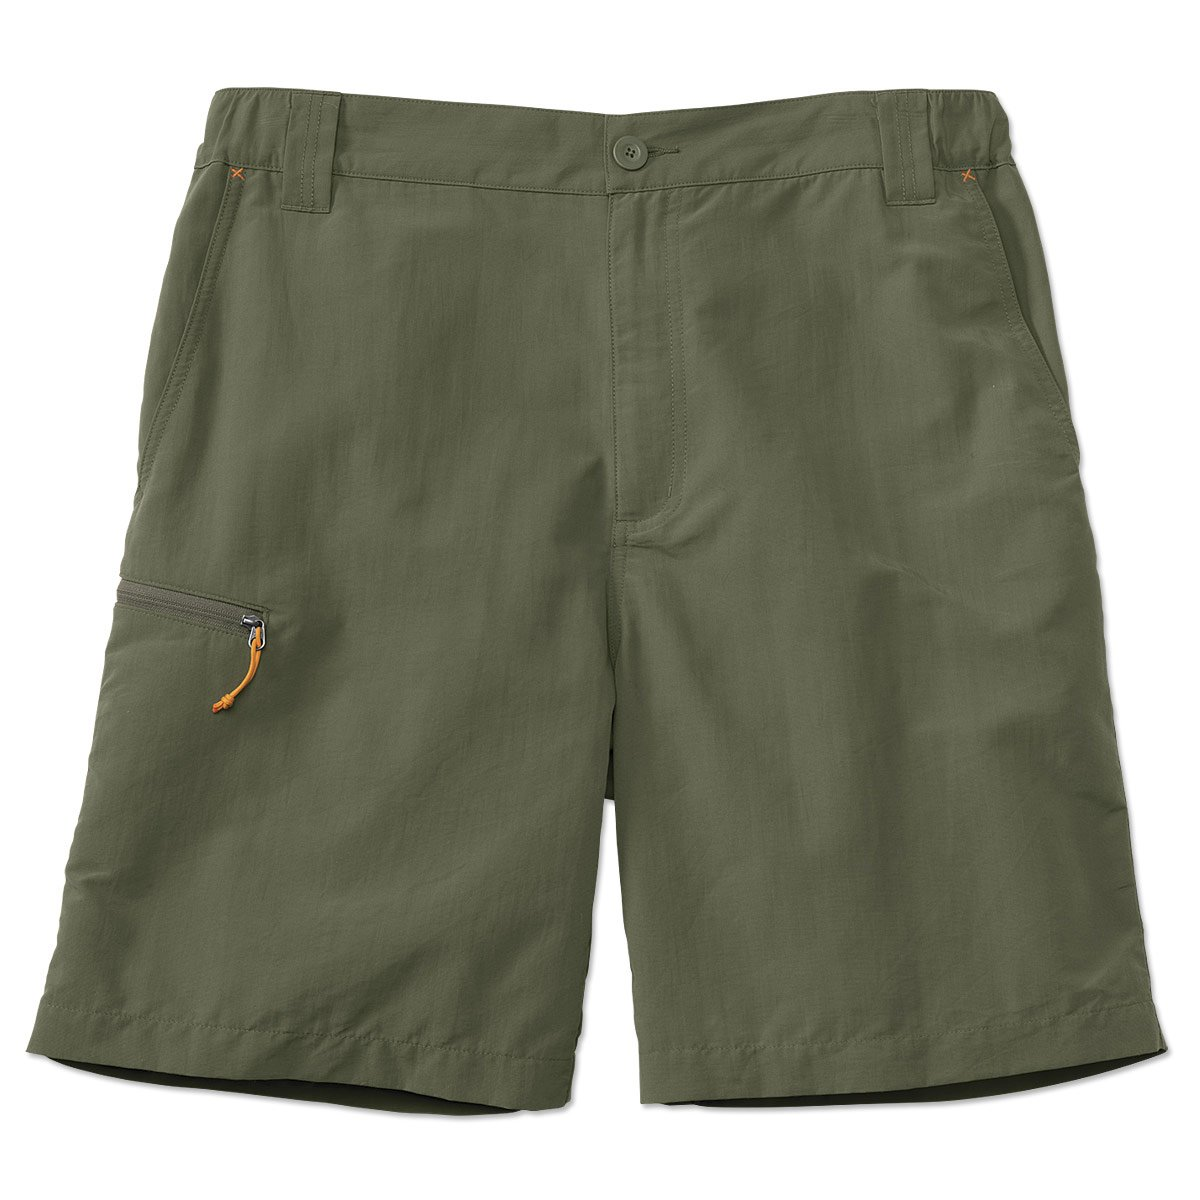 Orvis Jackson Quick-Dry Shorts, Olive, 2XL